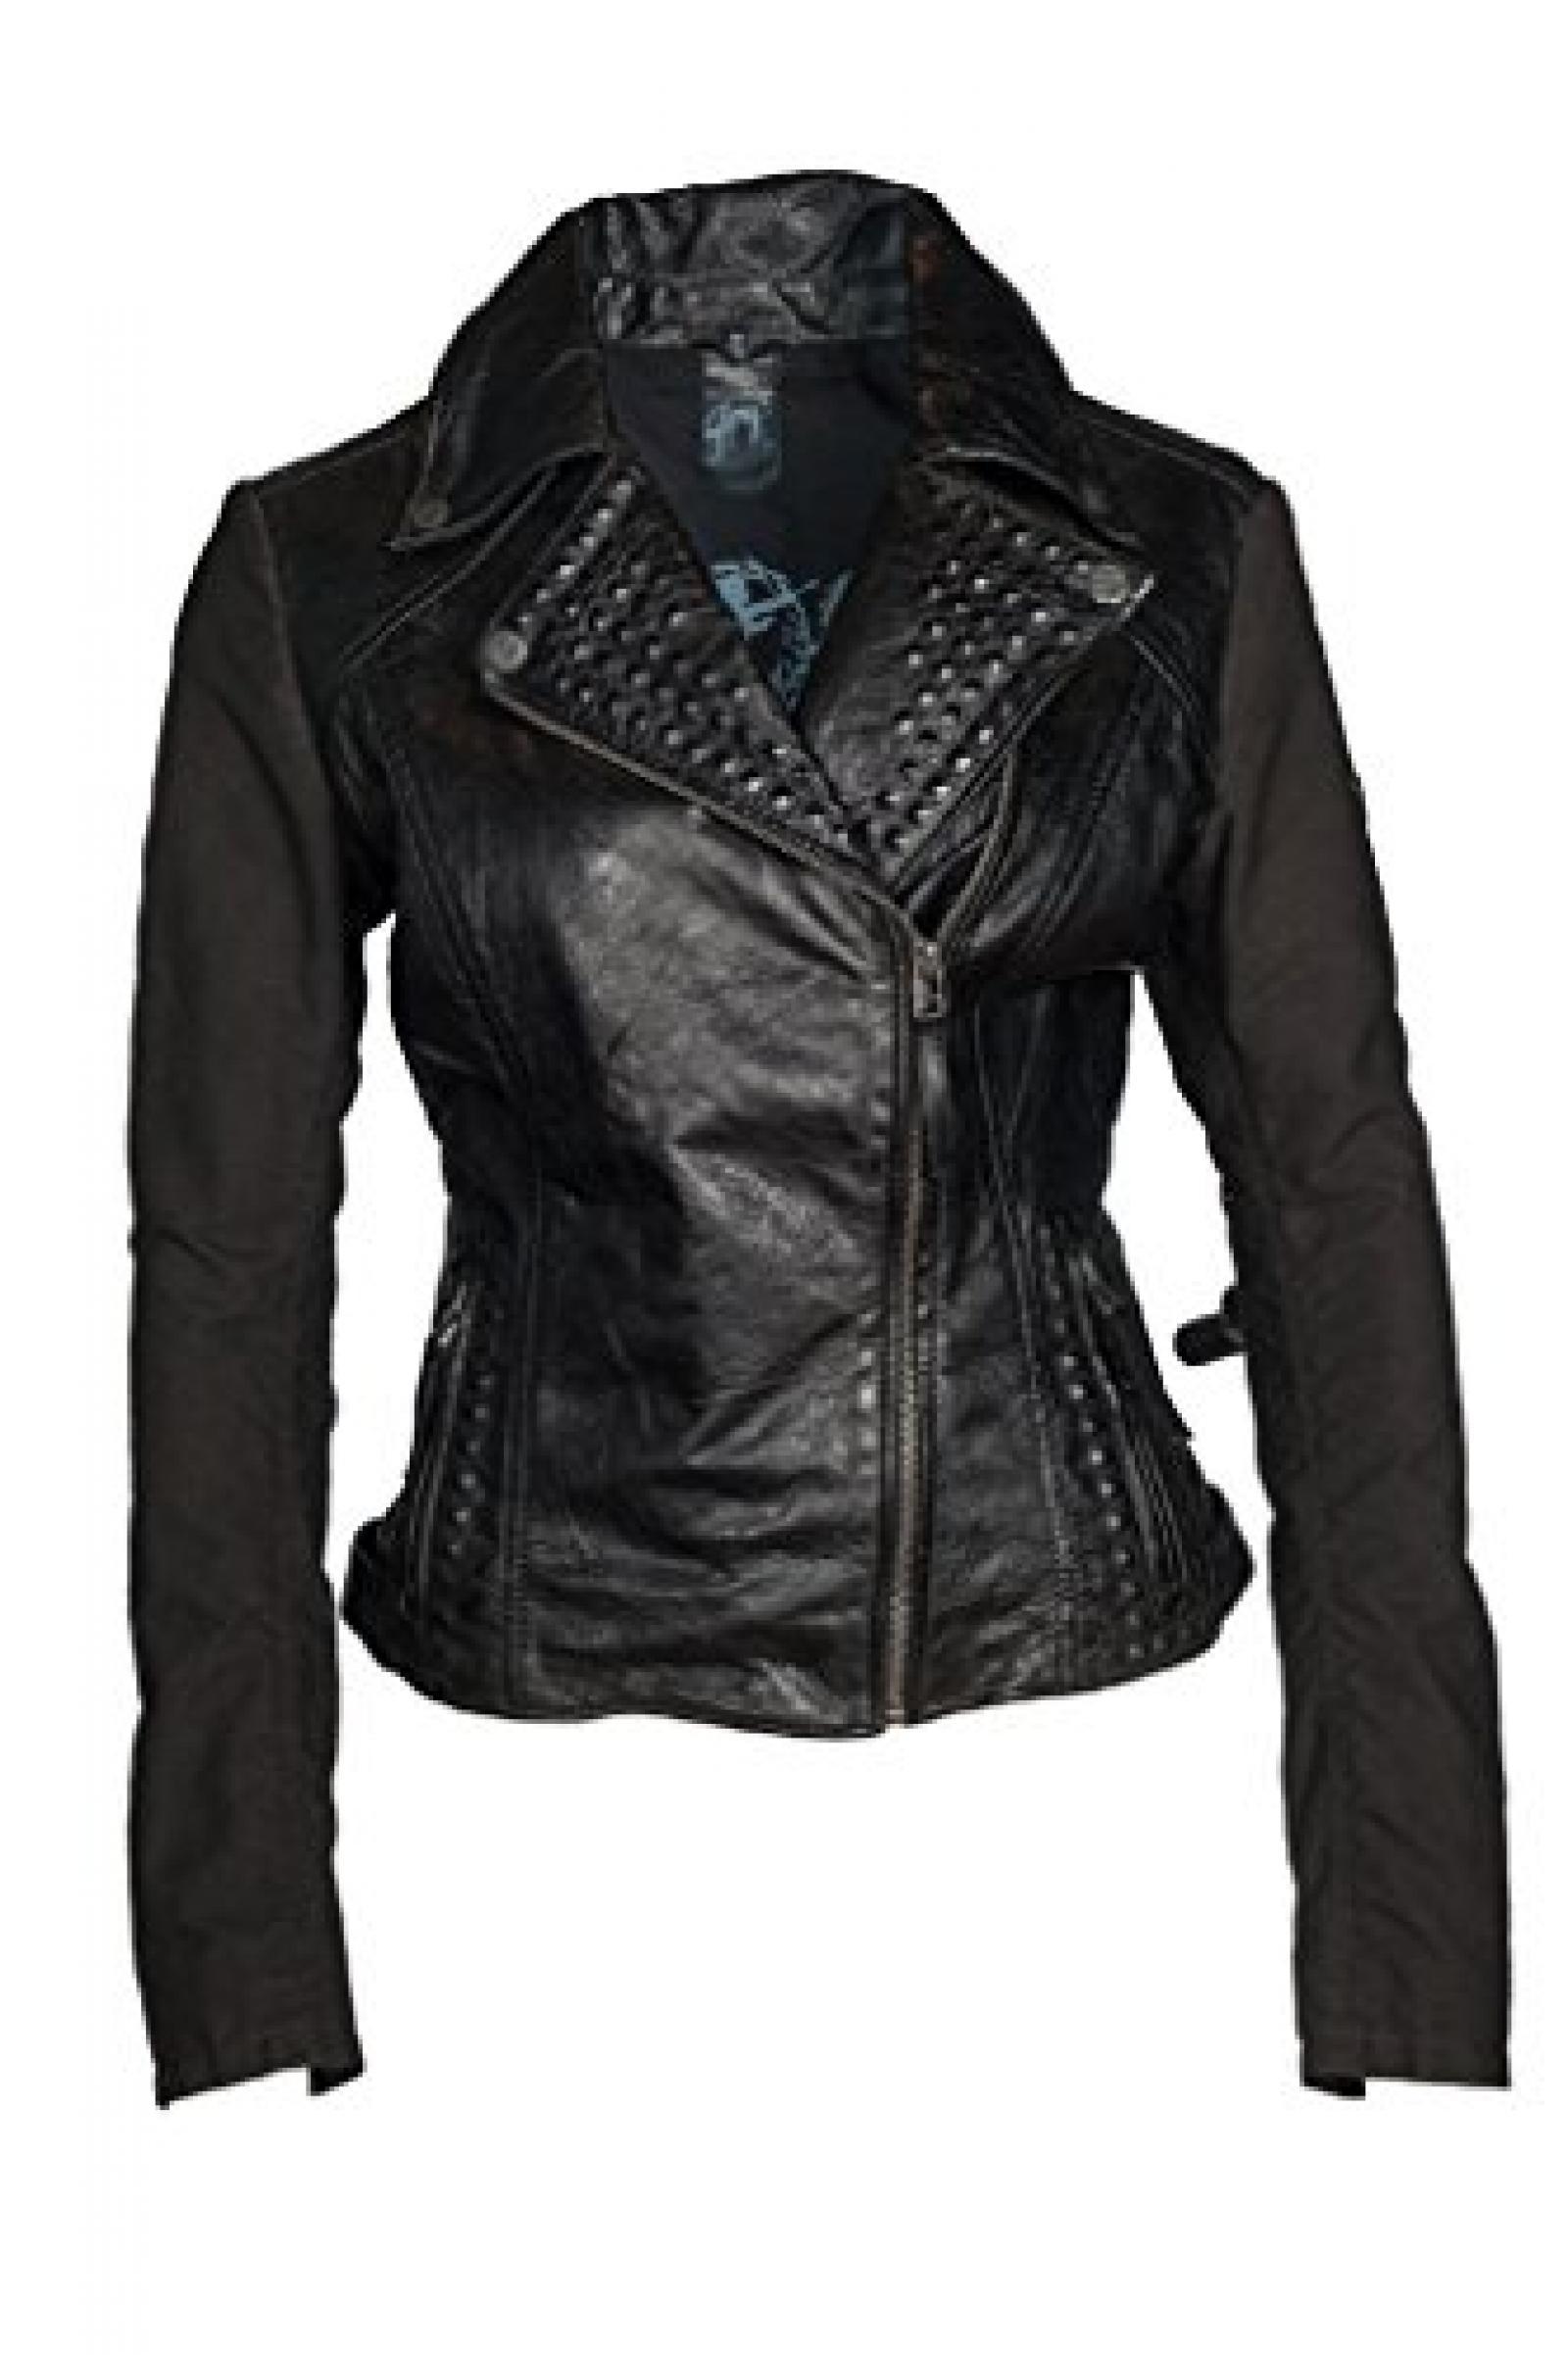 Marcella Black Gipsy Lederjacke, Damen, Outerwear